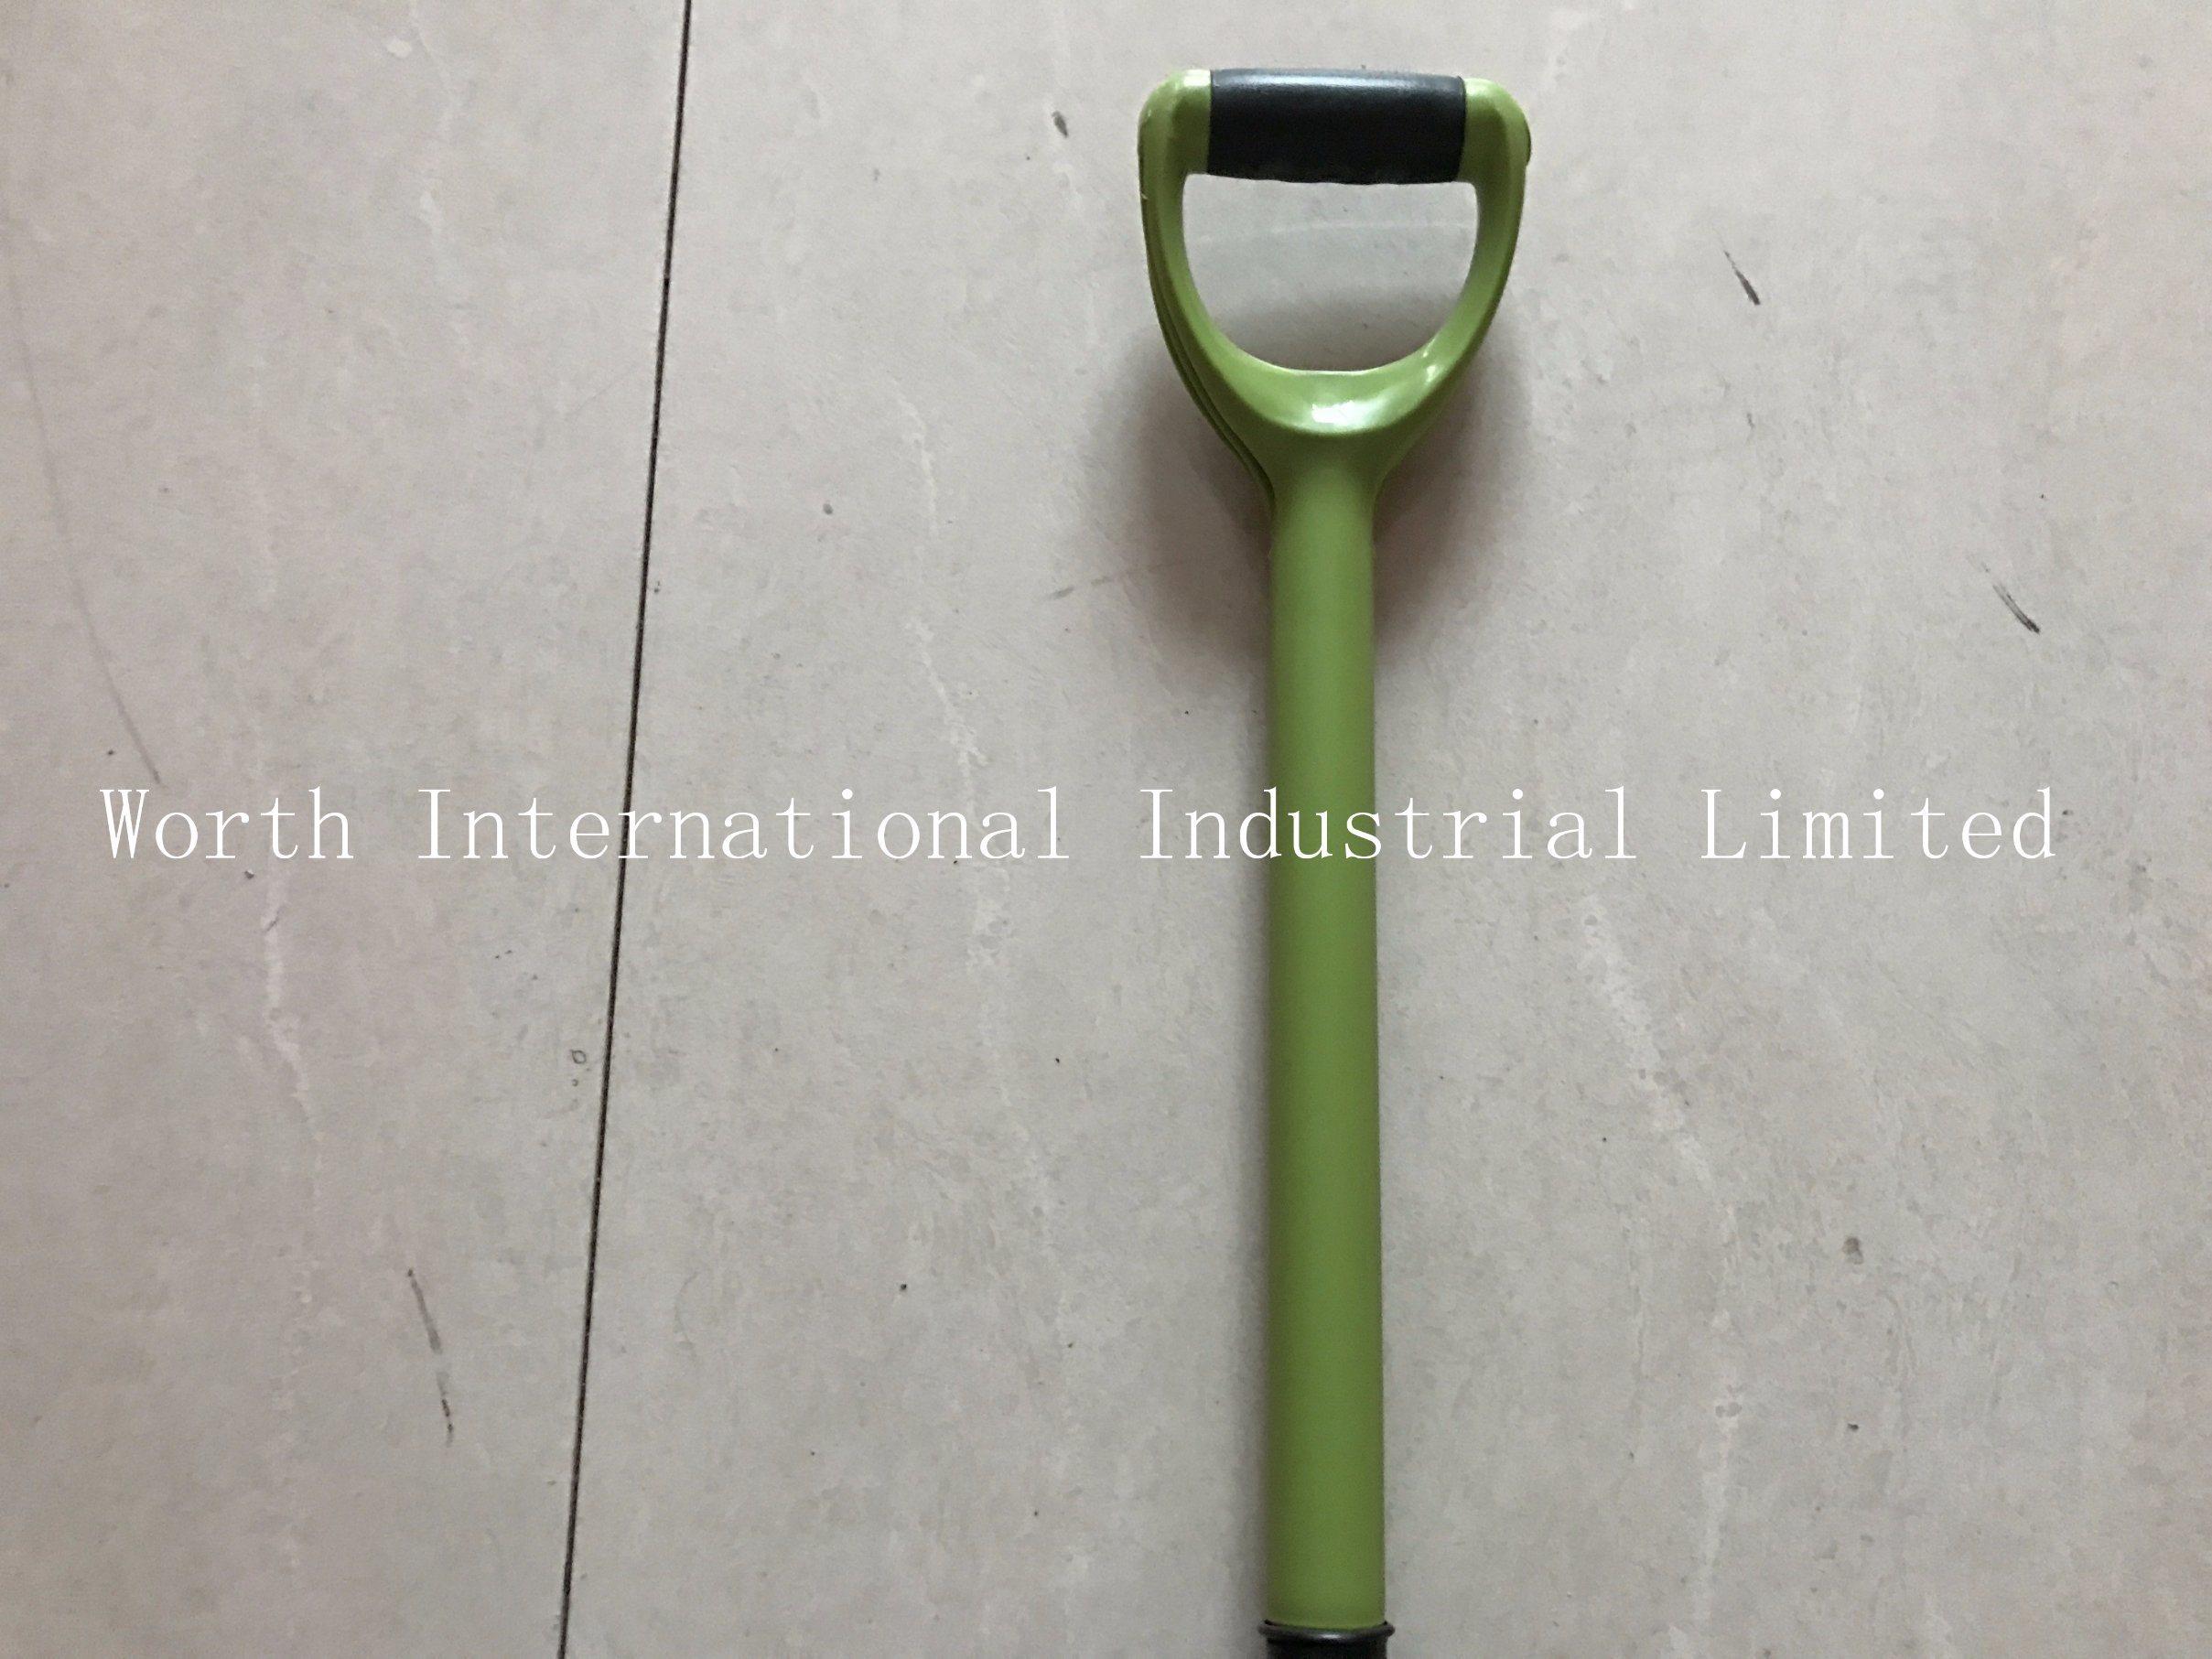 Iron Power Coated Fiberglass Handle Spade